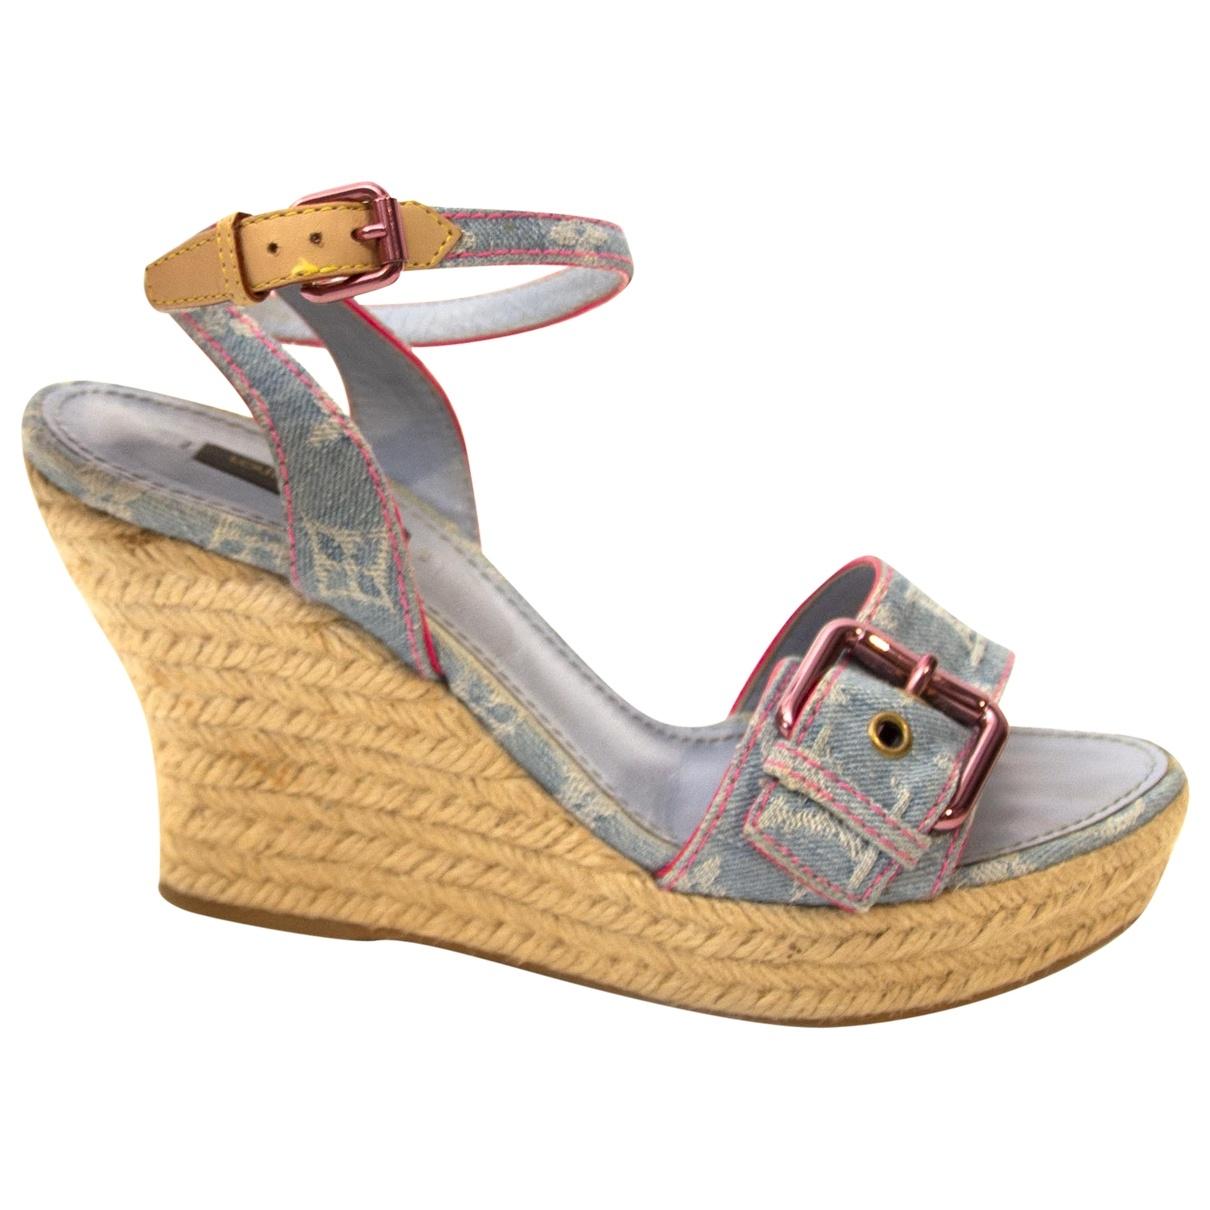 Louis Vuitton \N Beige Cloth Espadrilles for Women 38.5 EU